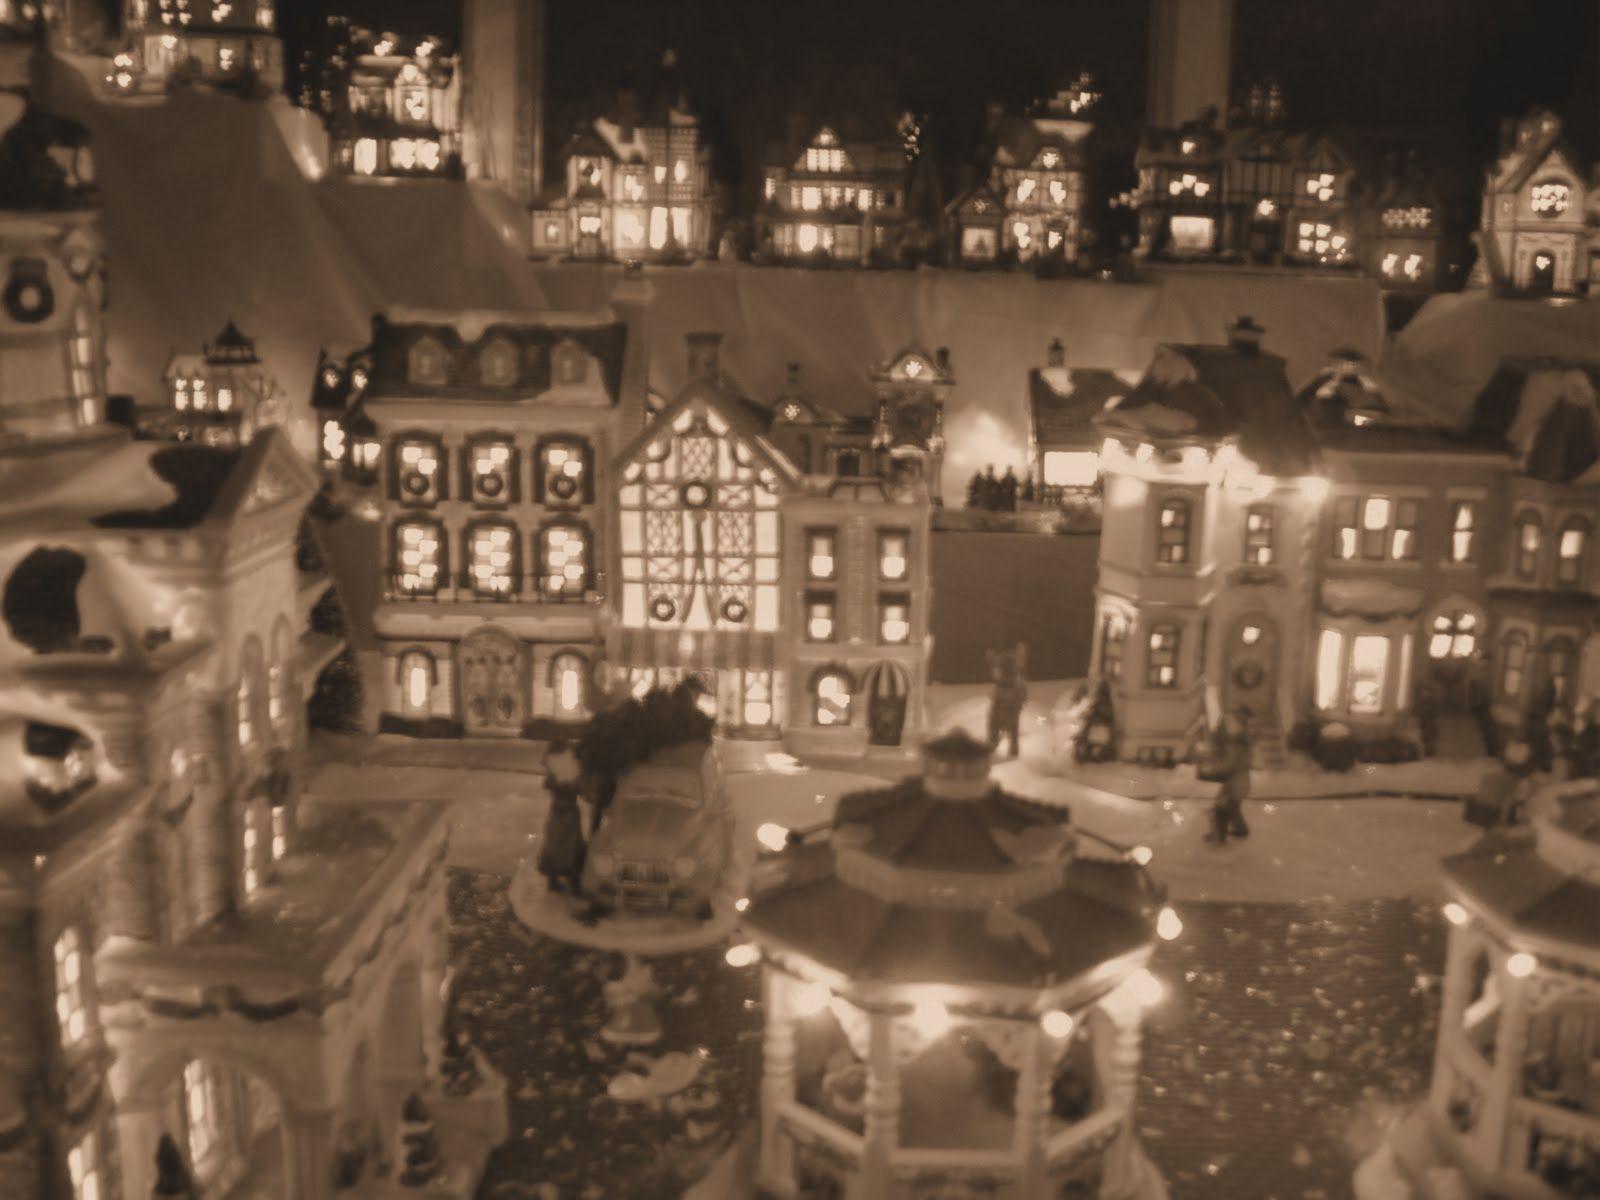 The 12 Pains Of Christmas.The 12 Pains Of Christmas Part 2 Bonnywood Manor